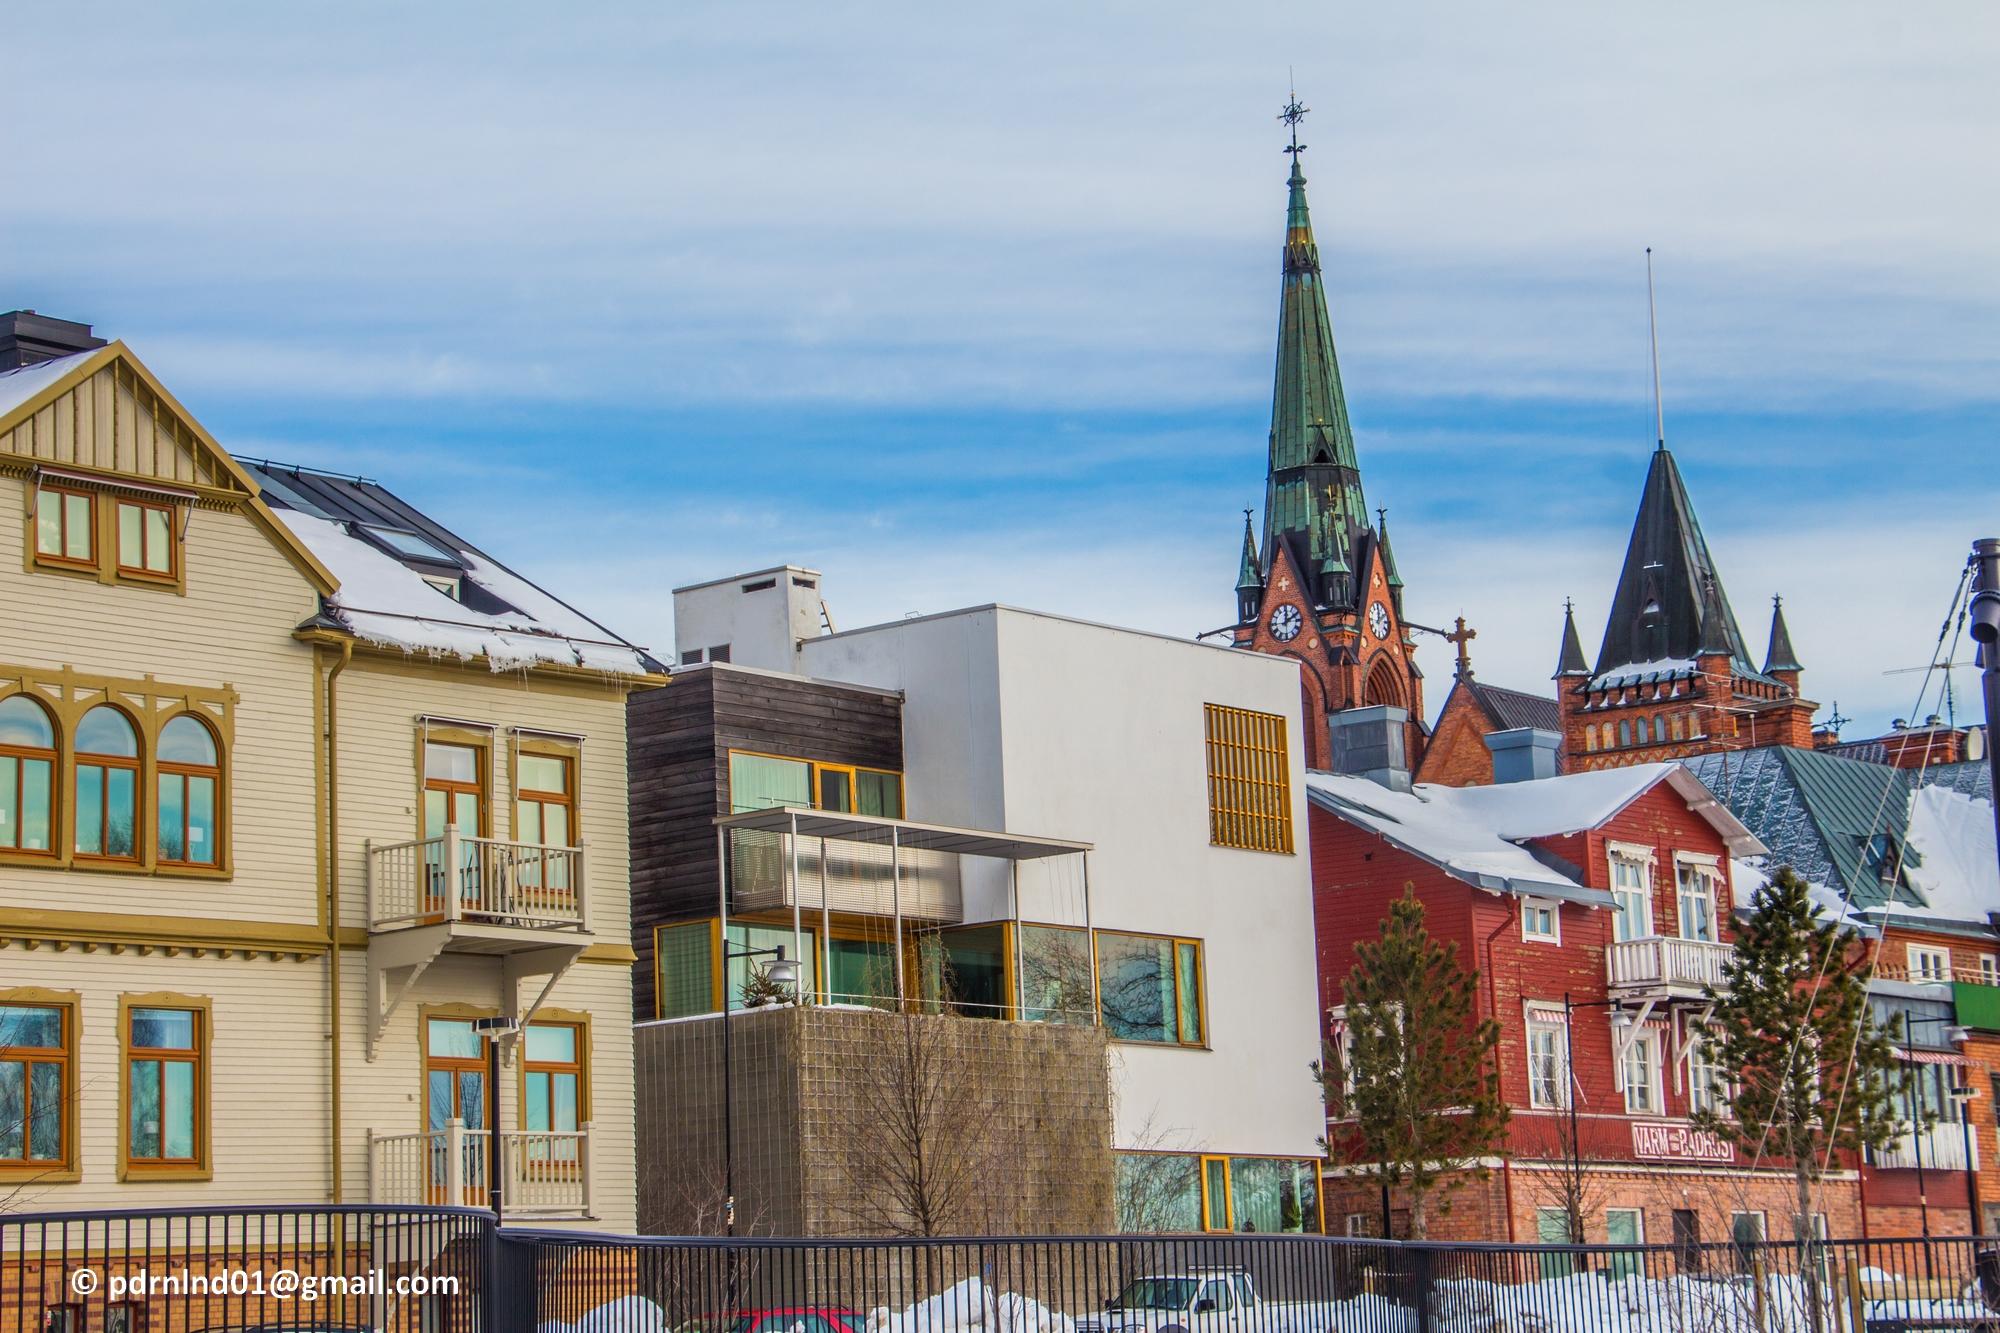 2016-02-27 Umeå 013-1